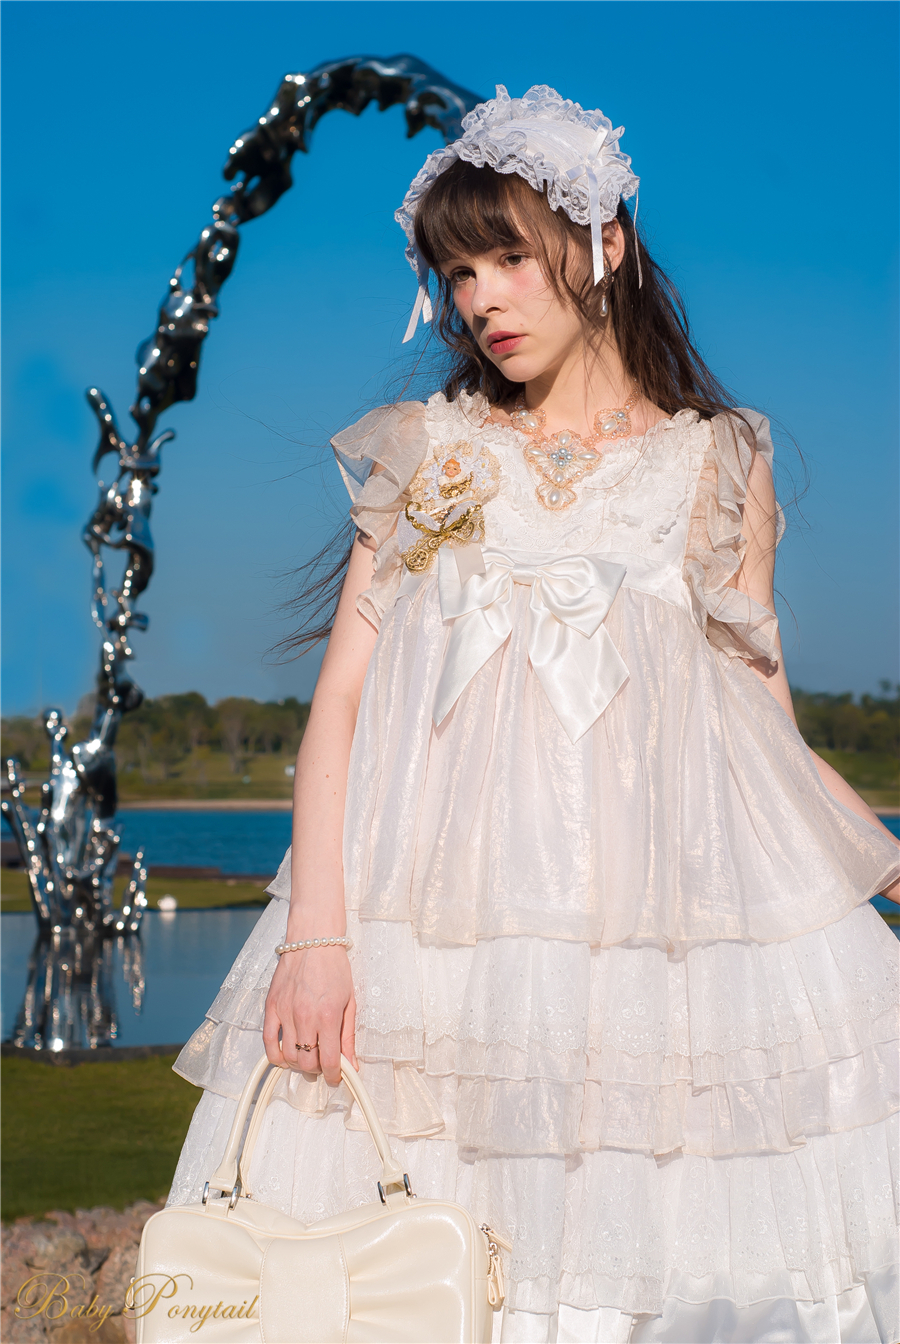 BabyPonytail_modelclaudia_Present Angel White JSK park02.jpg